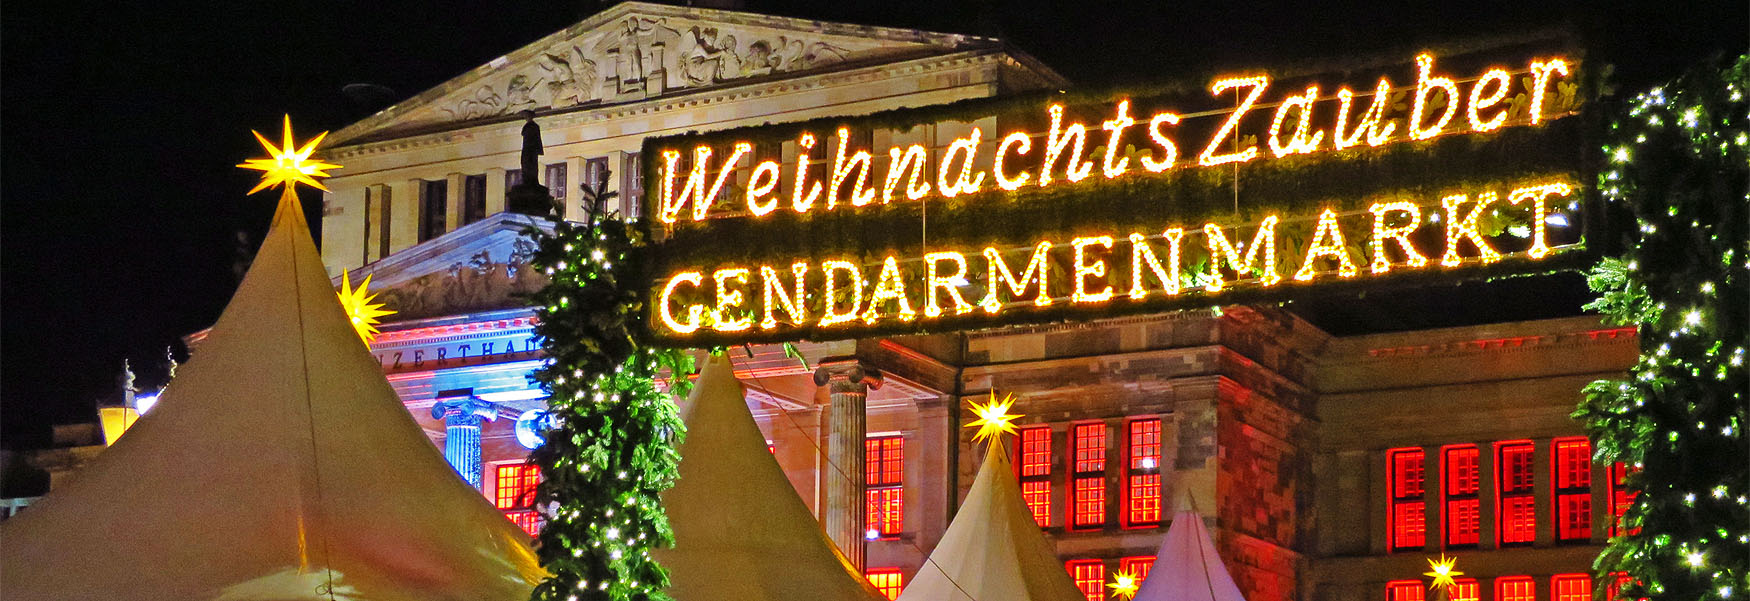 die sch nsten weihnachtsm rkte in berlin kultur24 berlin. Black Bedroom Furniture Sets. Home Design Ideas